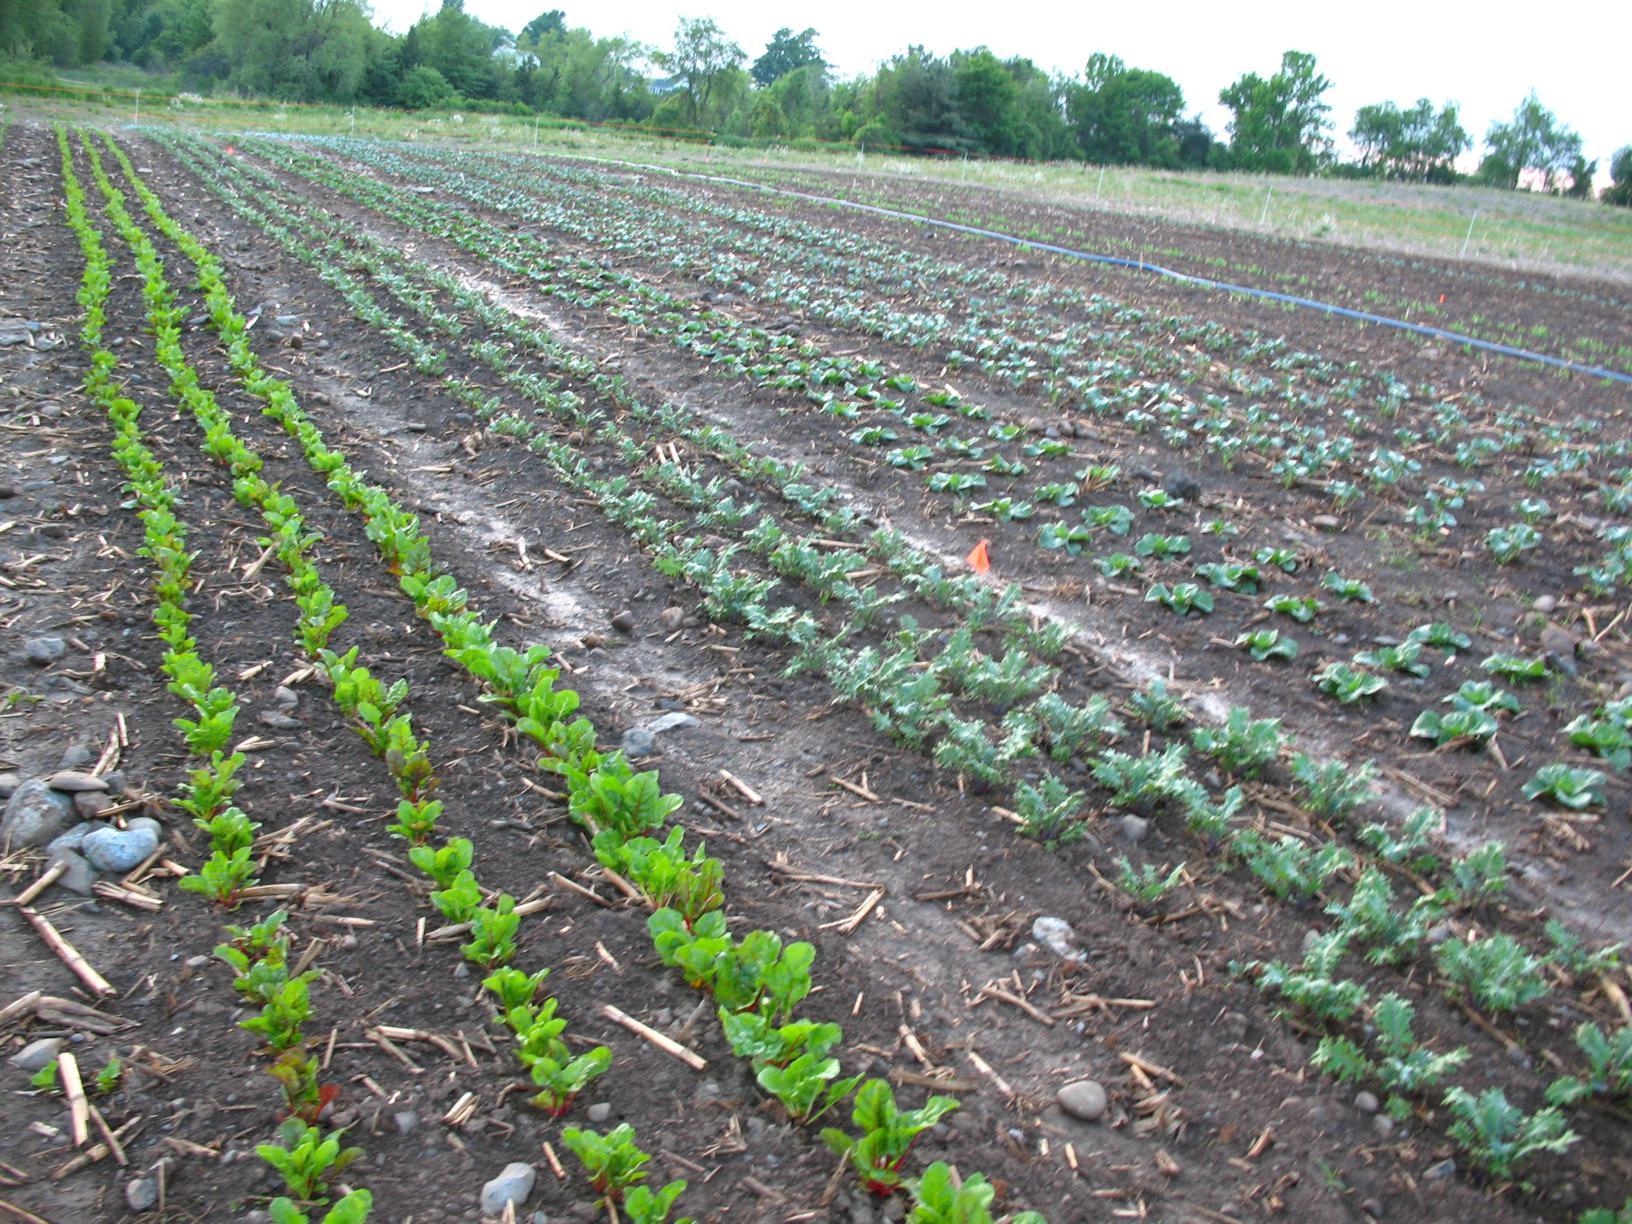 Pre-rain-baby-crops_1632x1224.jpg